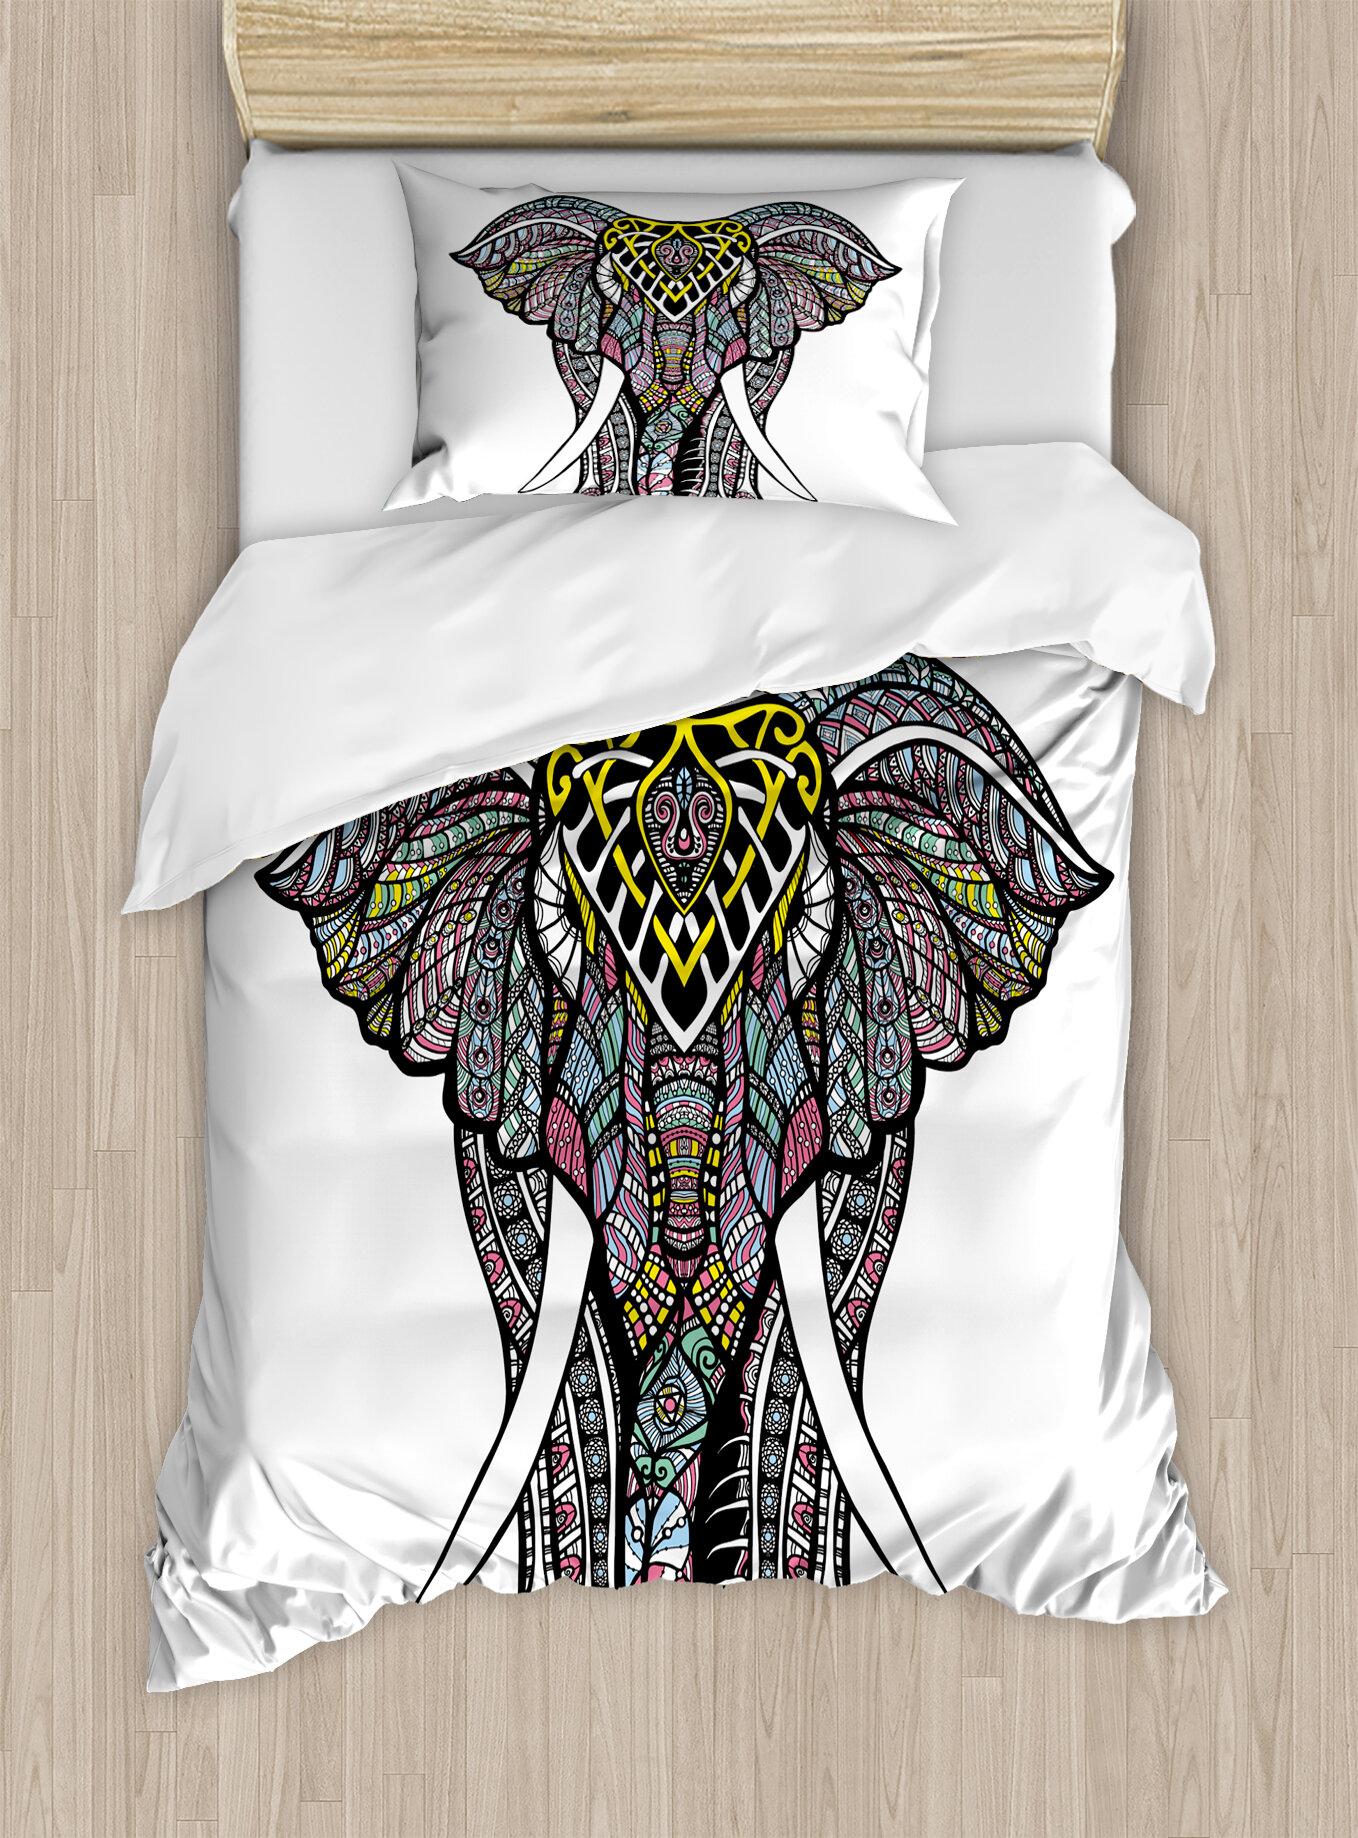 elephant mandala sacred symbol of strength spirit animal indian religion bohemian design duvet cover set